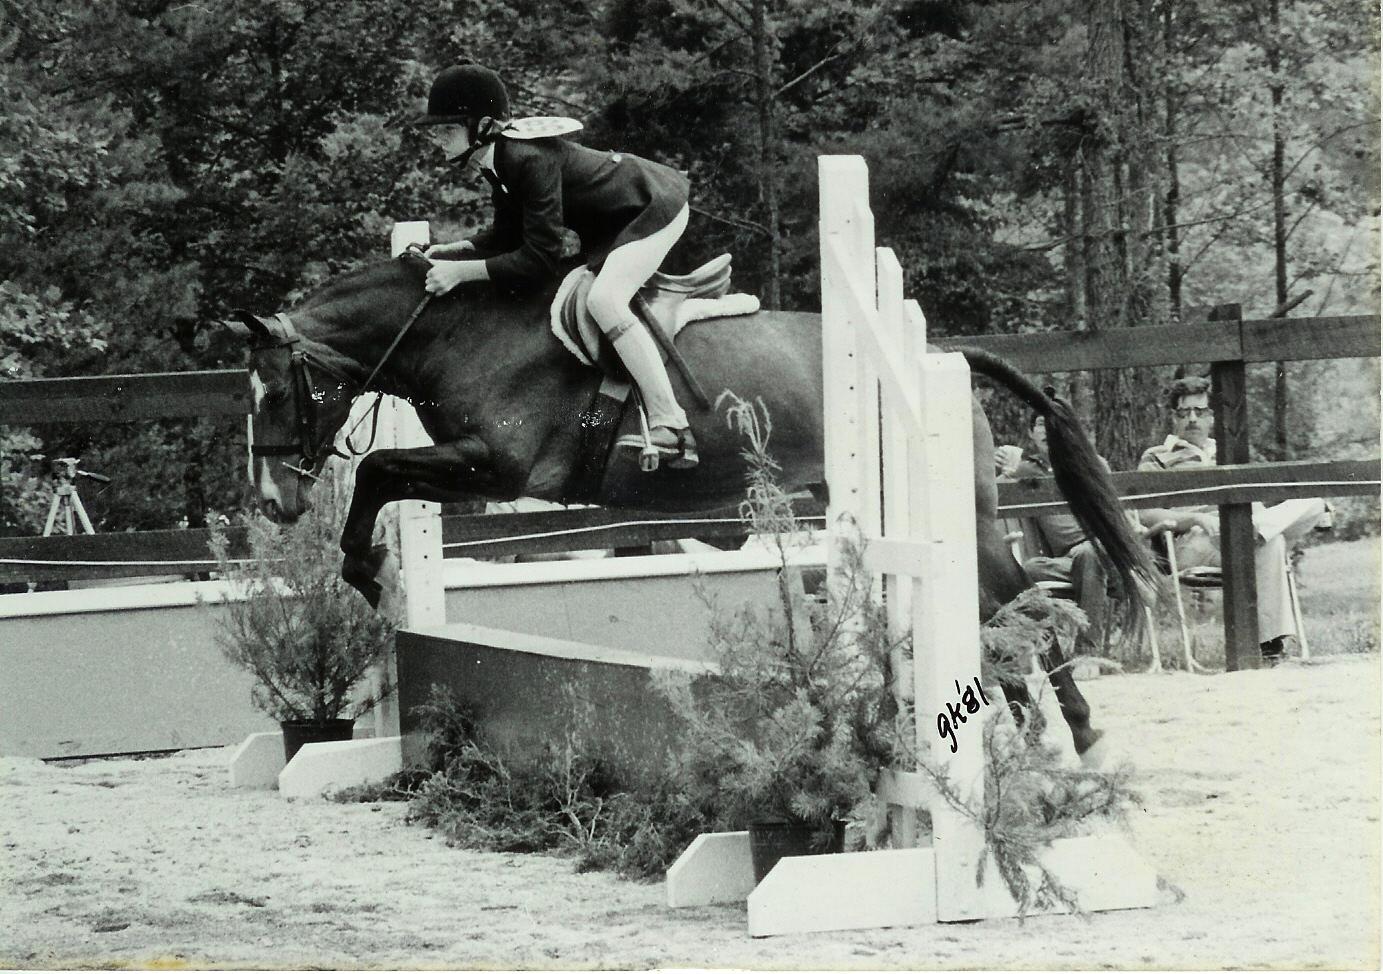 Elfin, aka Corky & April Carter at Fiesta Farm 1980